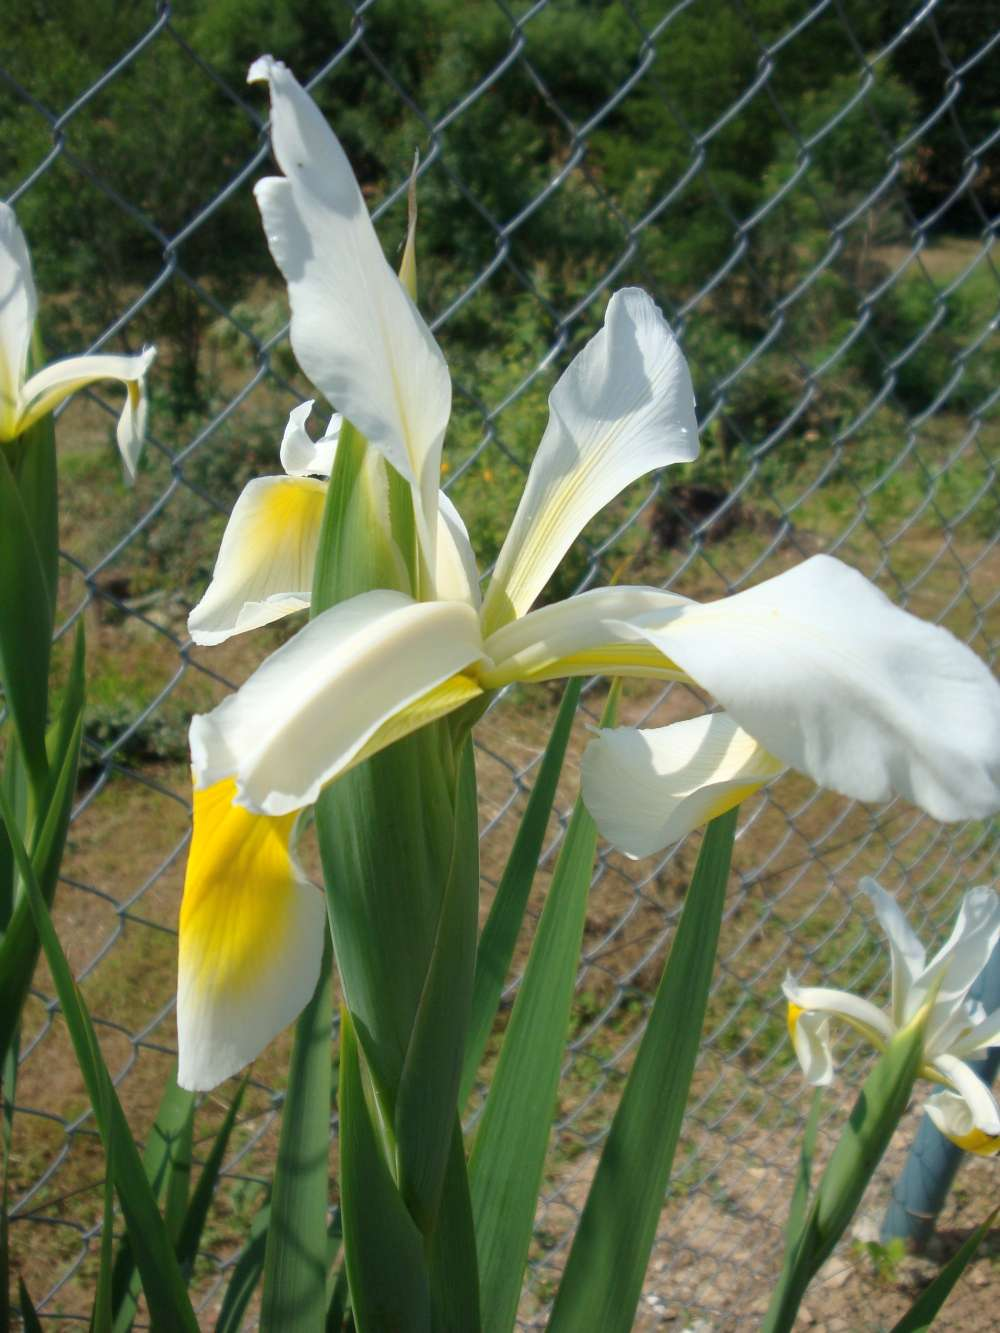 biely iris - Obrázok č. 1